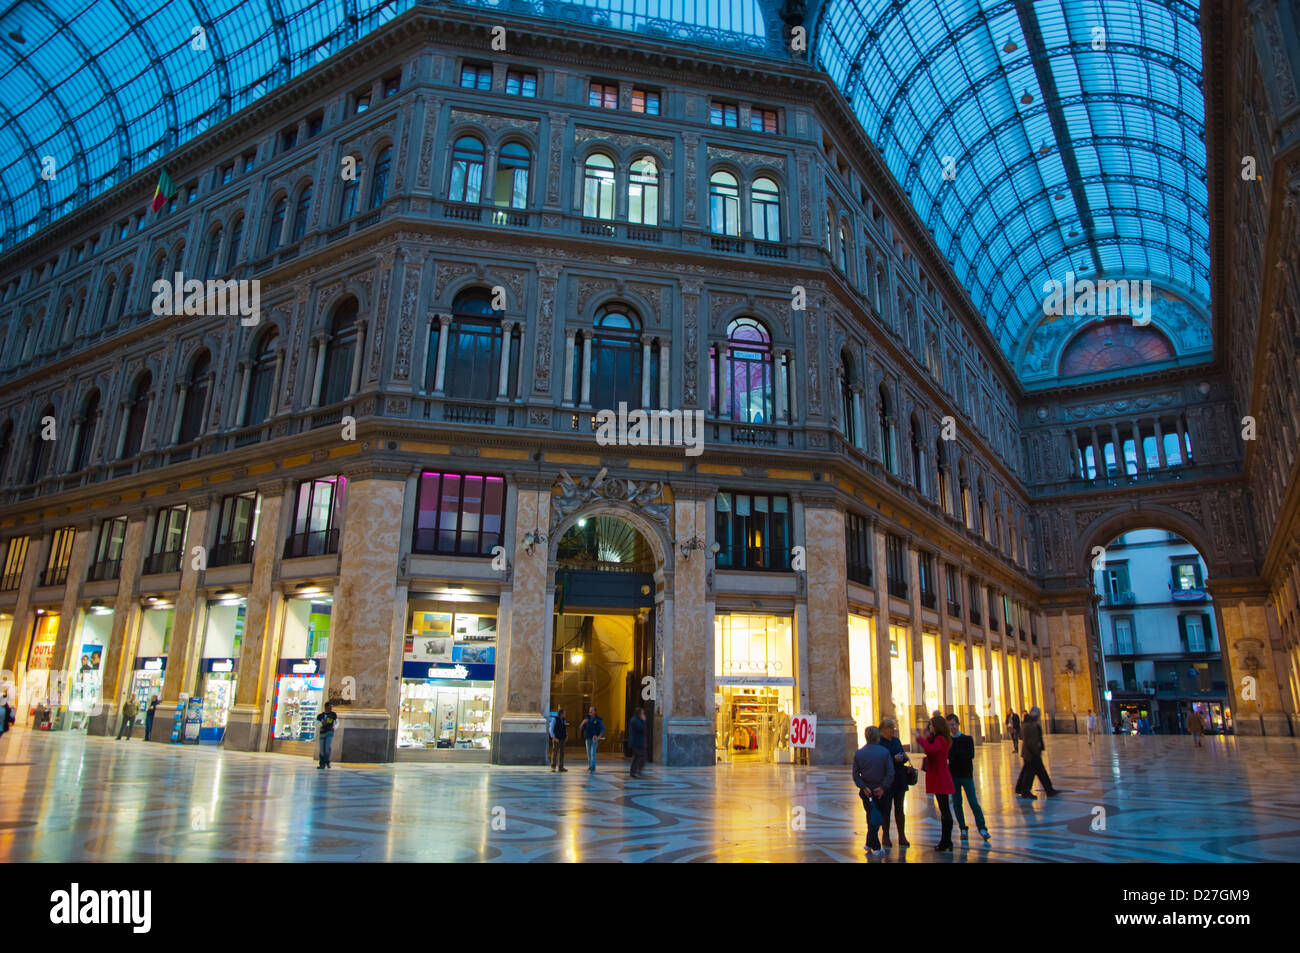 Galleria Umberto I (1900) shopping arcade central Naples city La Campania region southern Italy Europe - Stock Image